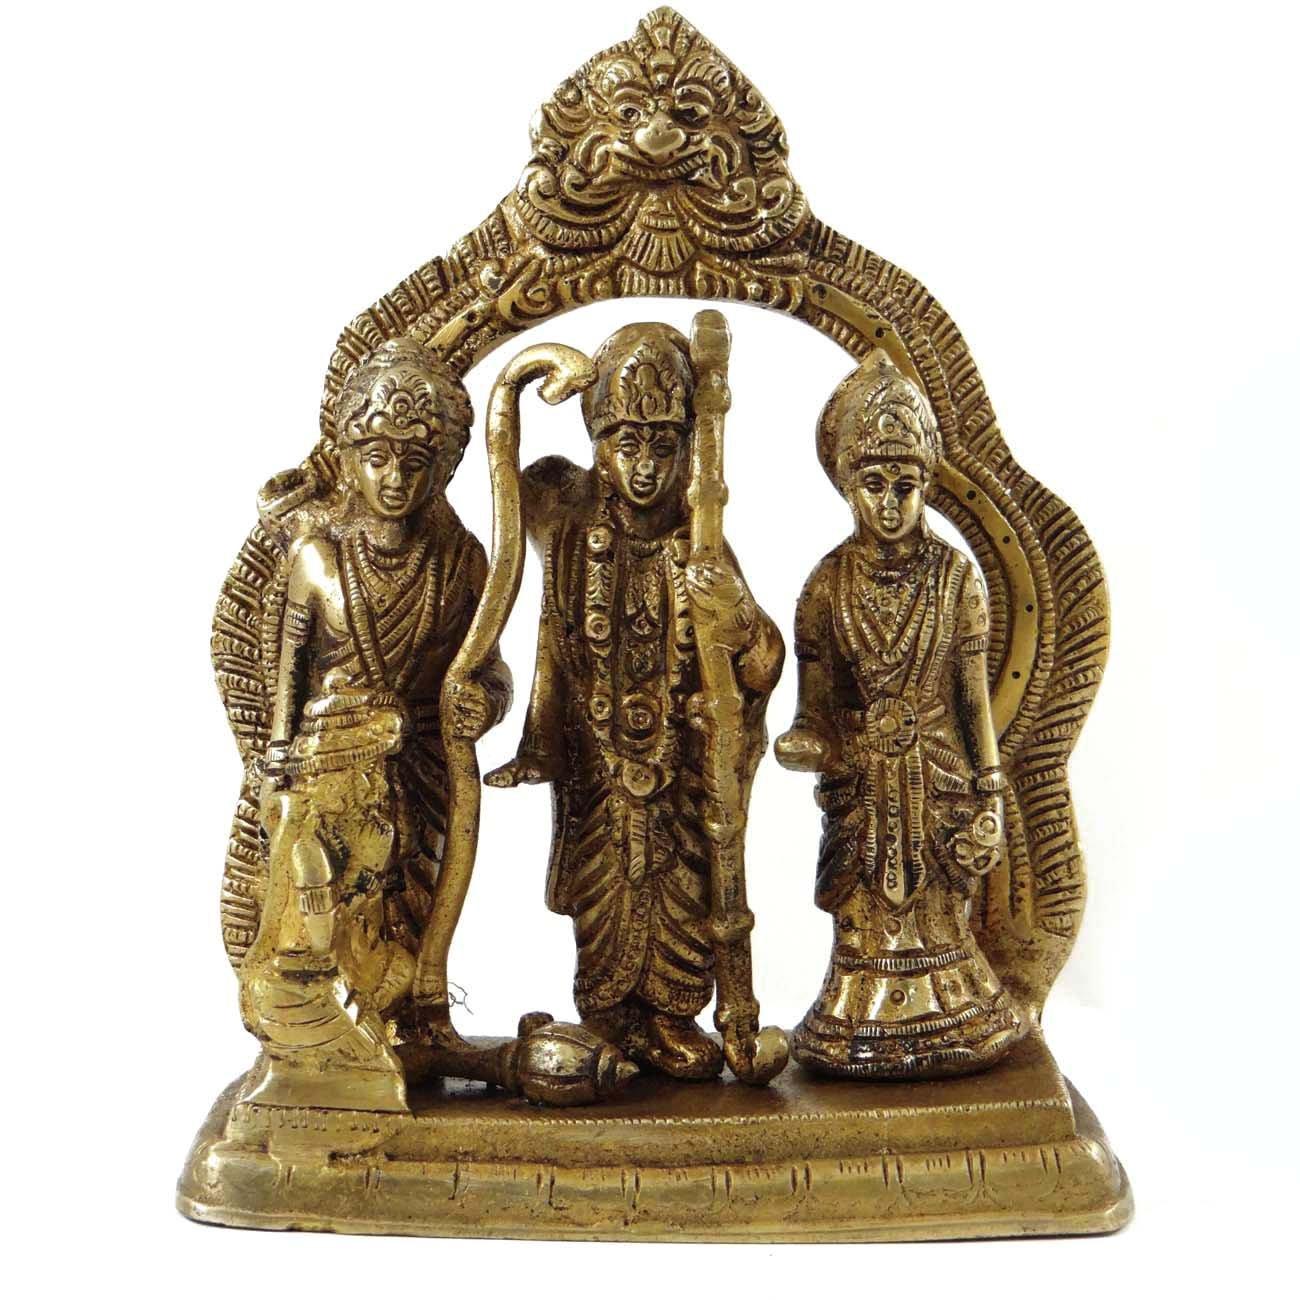 Religious Ram Darbar真鍮メタル図従来StatueホームD Cor Sculpture B0725C437N